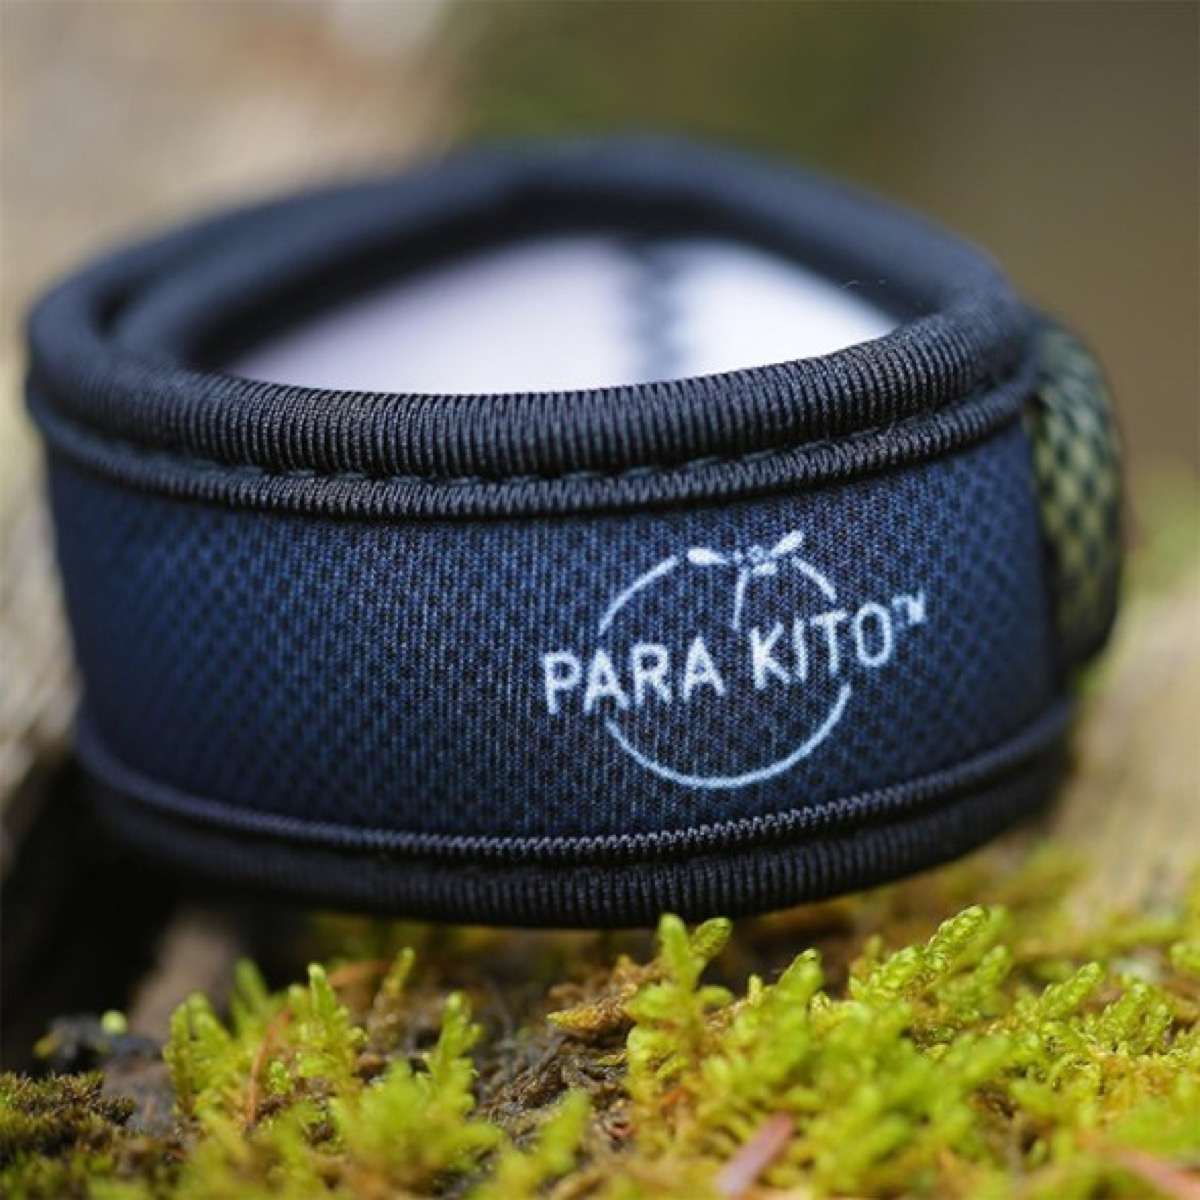 para'kito bug repelling bracelet